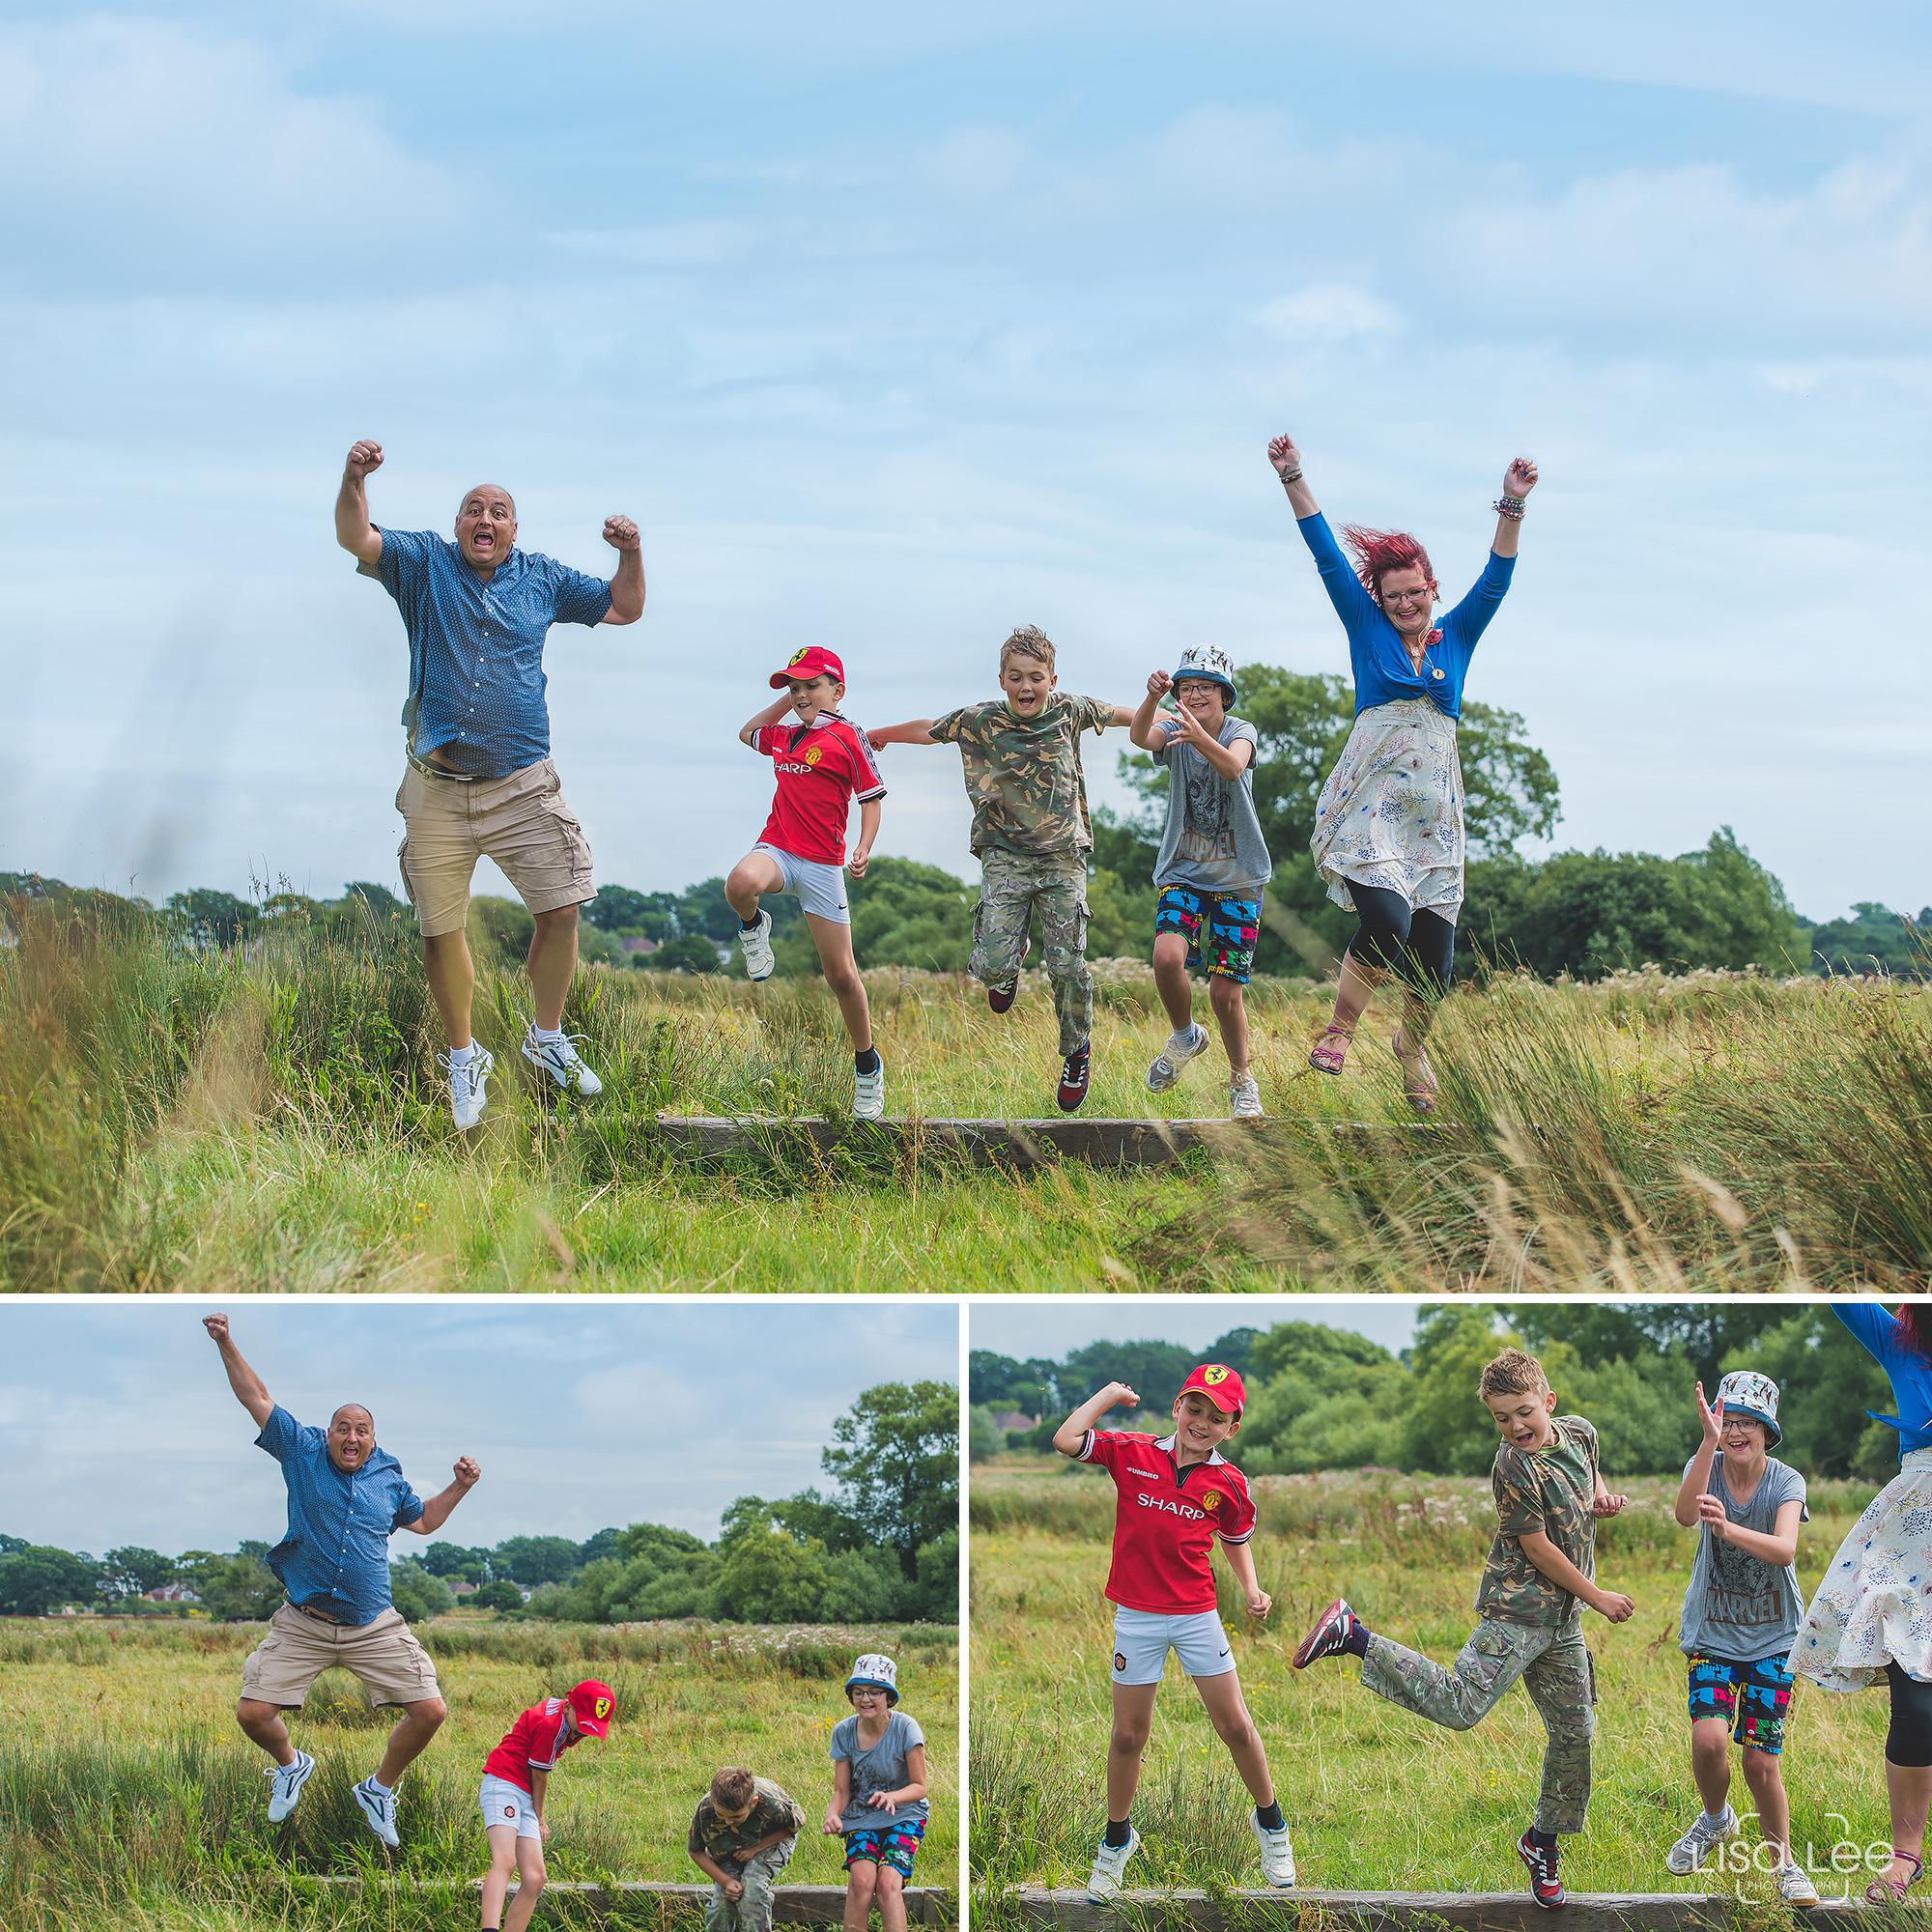 lisa-lee-photography-pateman-family-shoot-countryside-leap.jpg